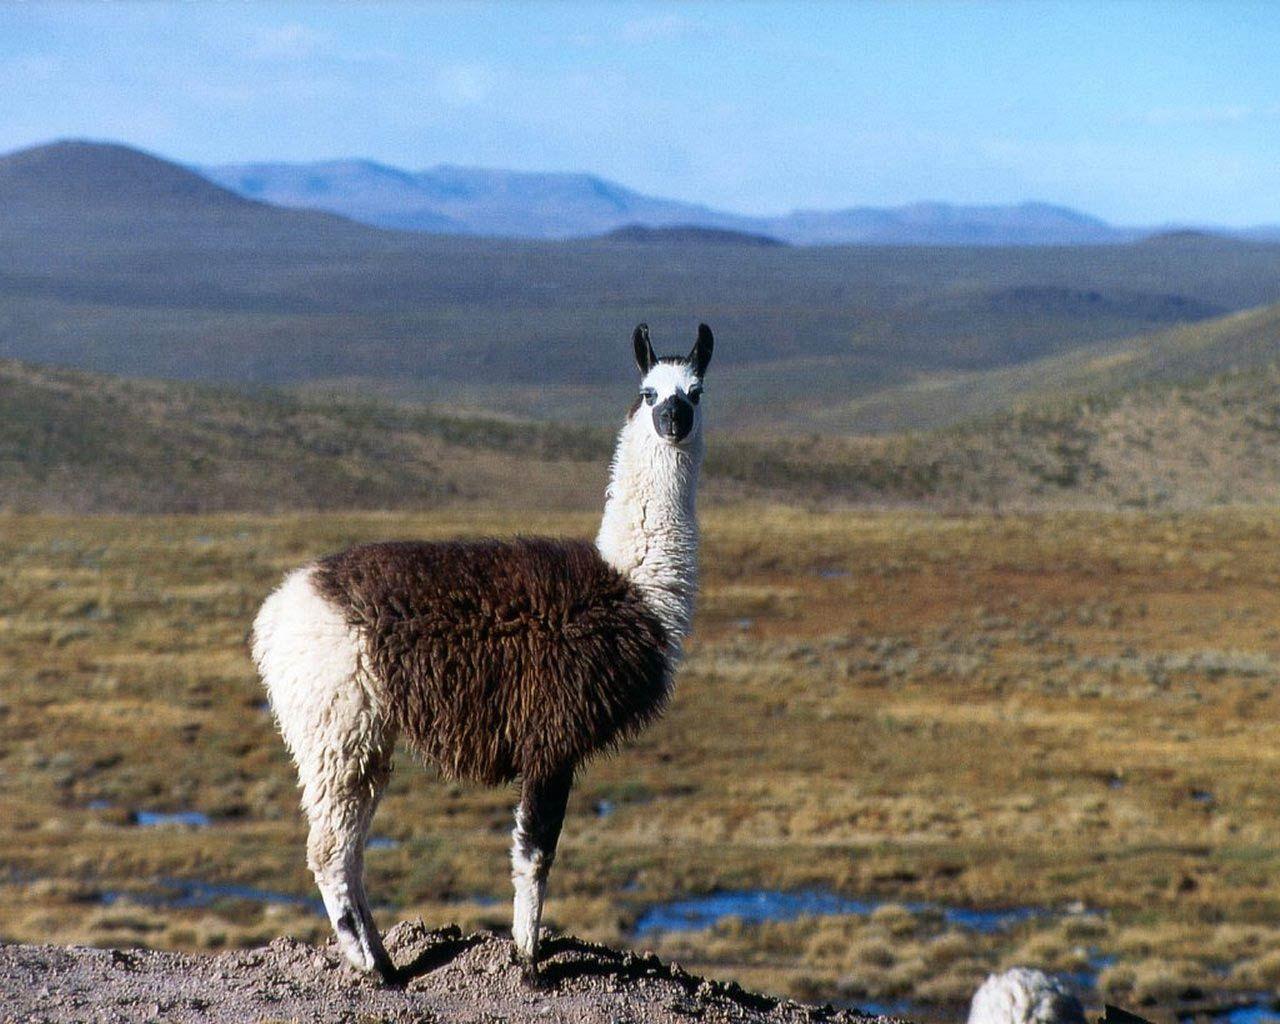 llama wallpapers hd Buscar con Google Llama